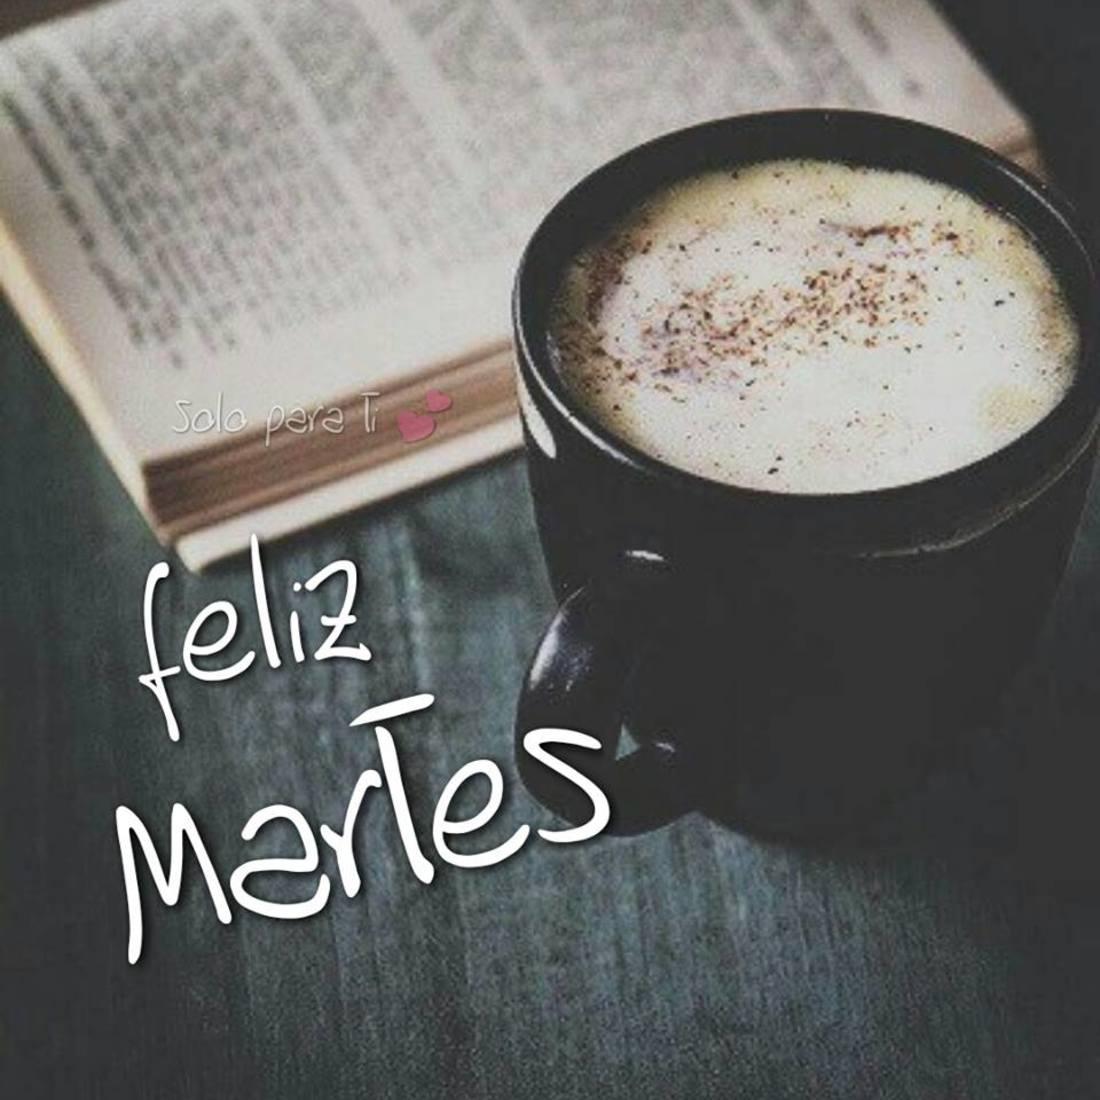 Feliz Martes con café